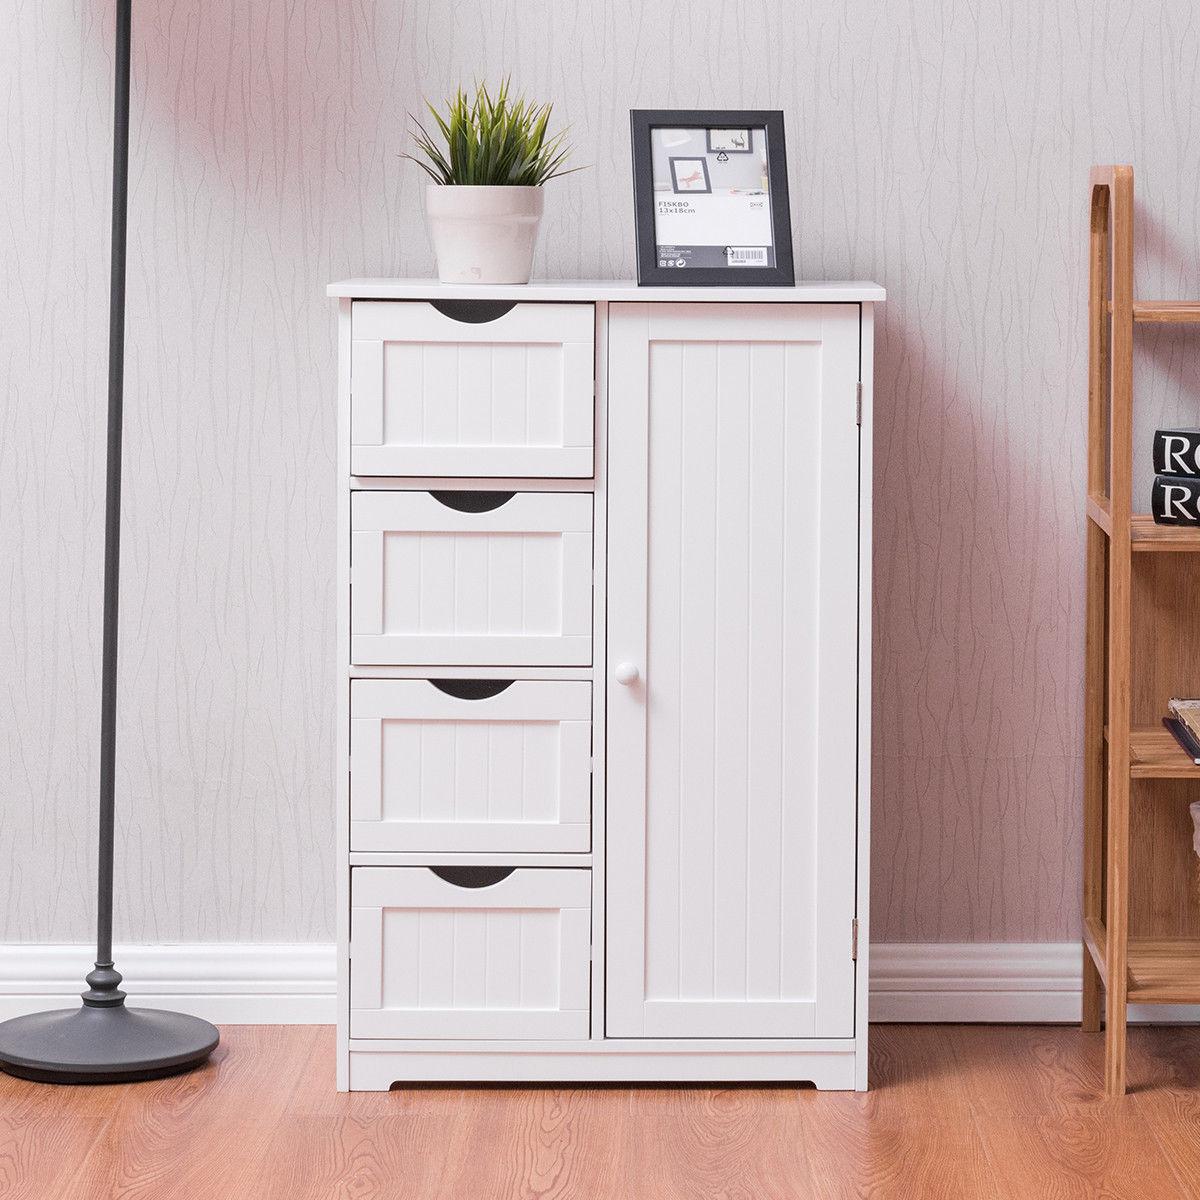 costway wooden 4 drawer bathroom cabinet storage cupboard